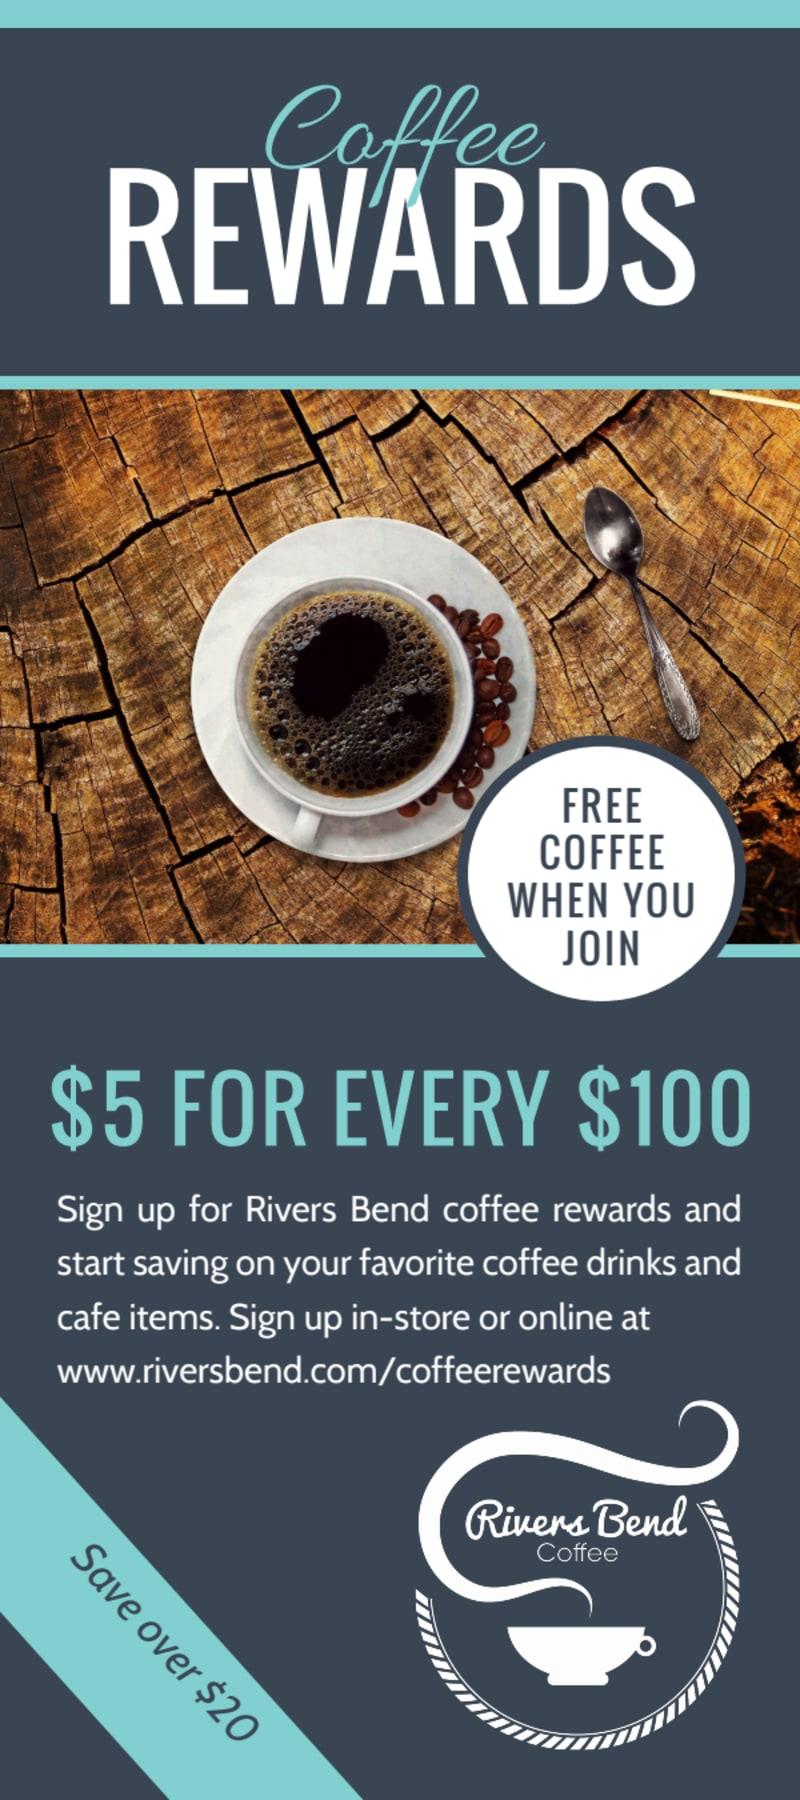 Coffee Rewards Program Flyer Template Preview 2